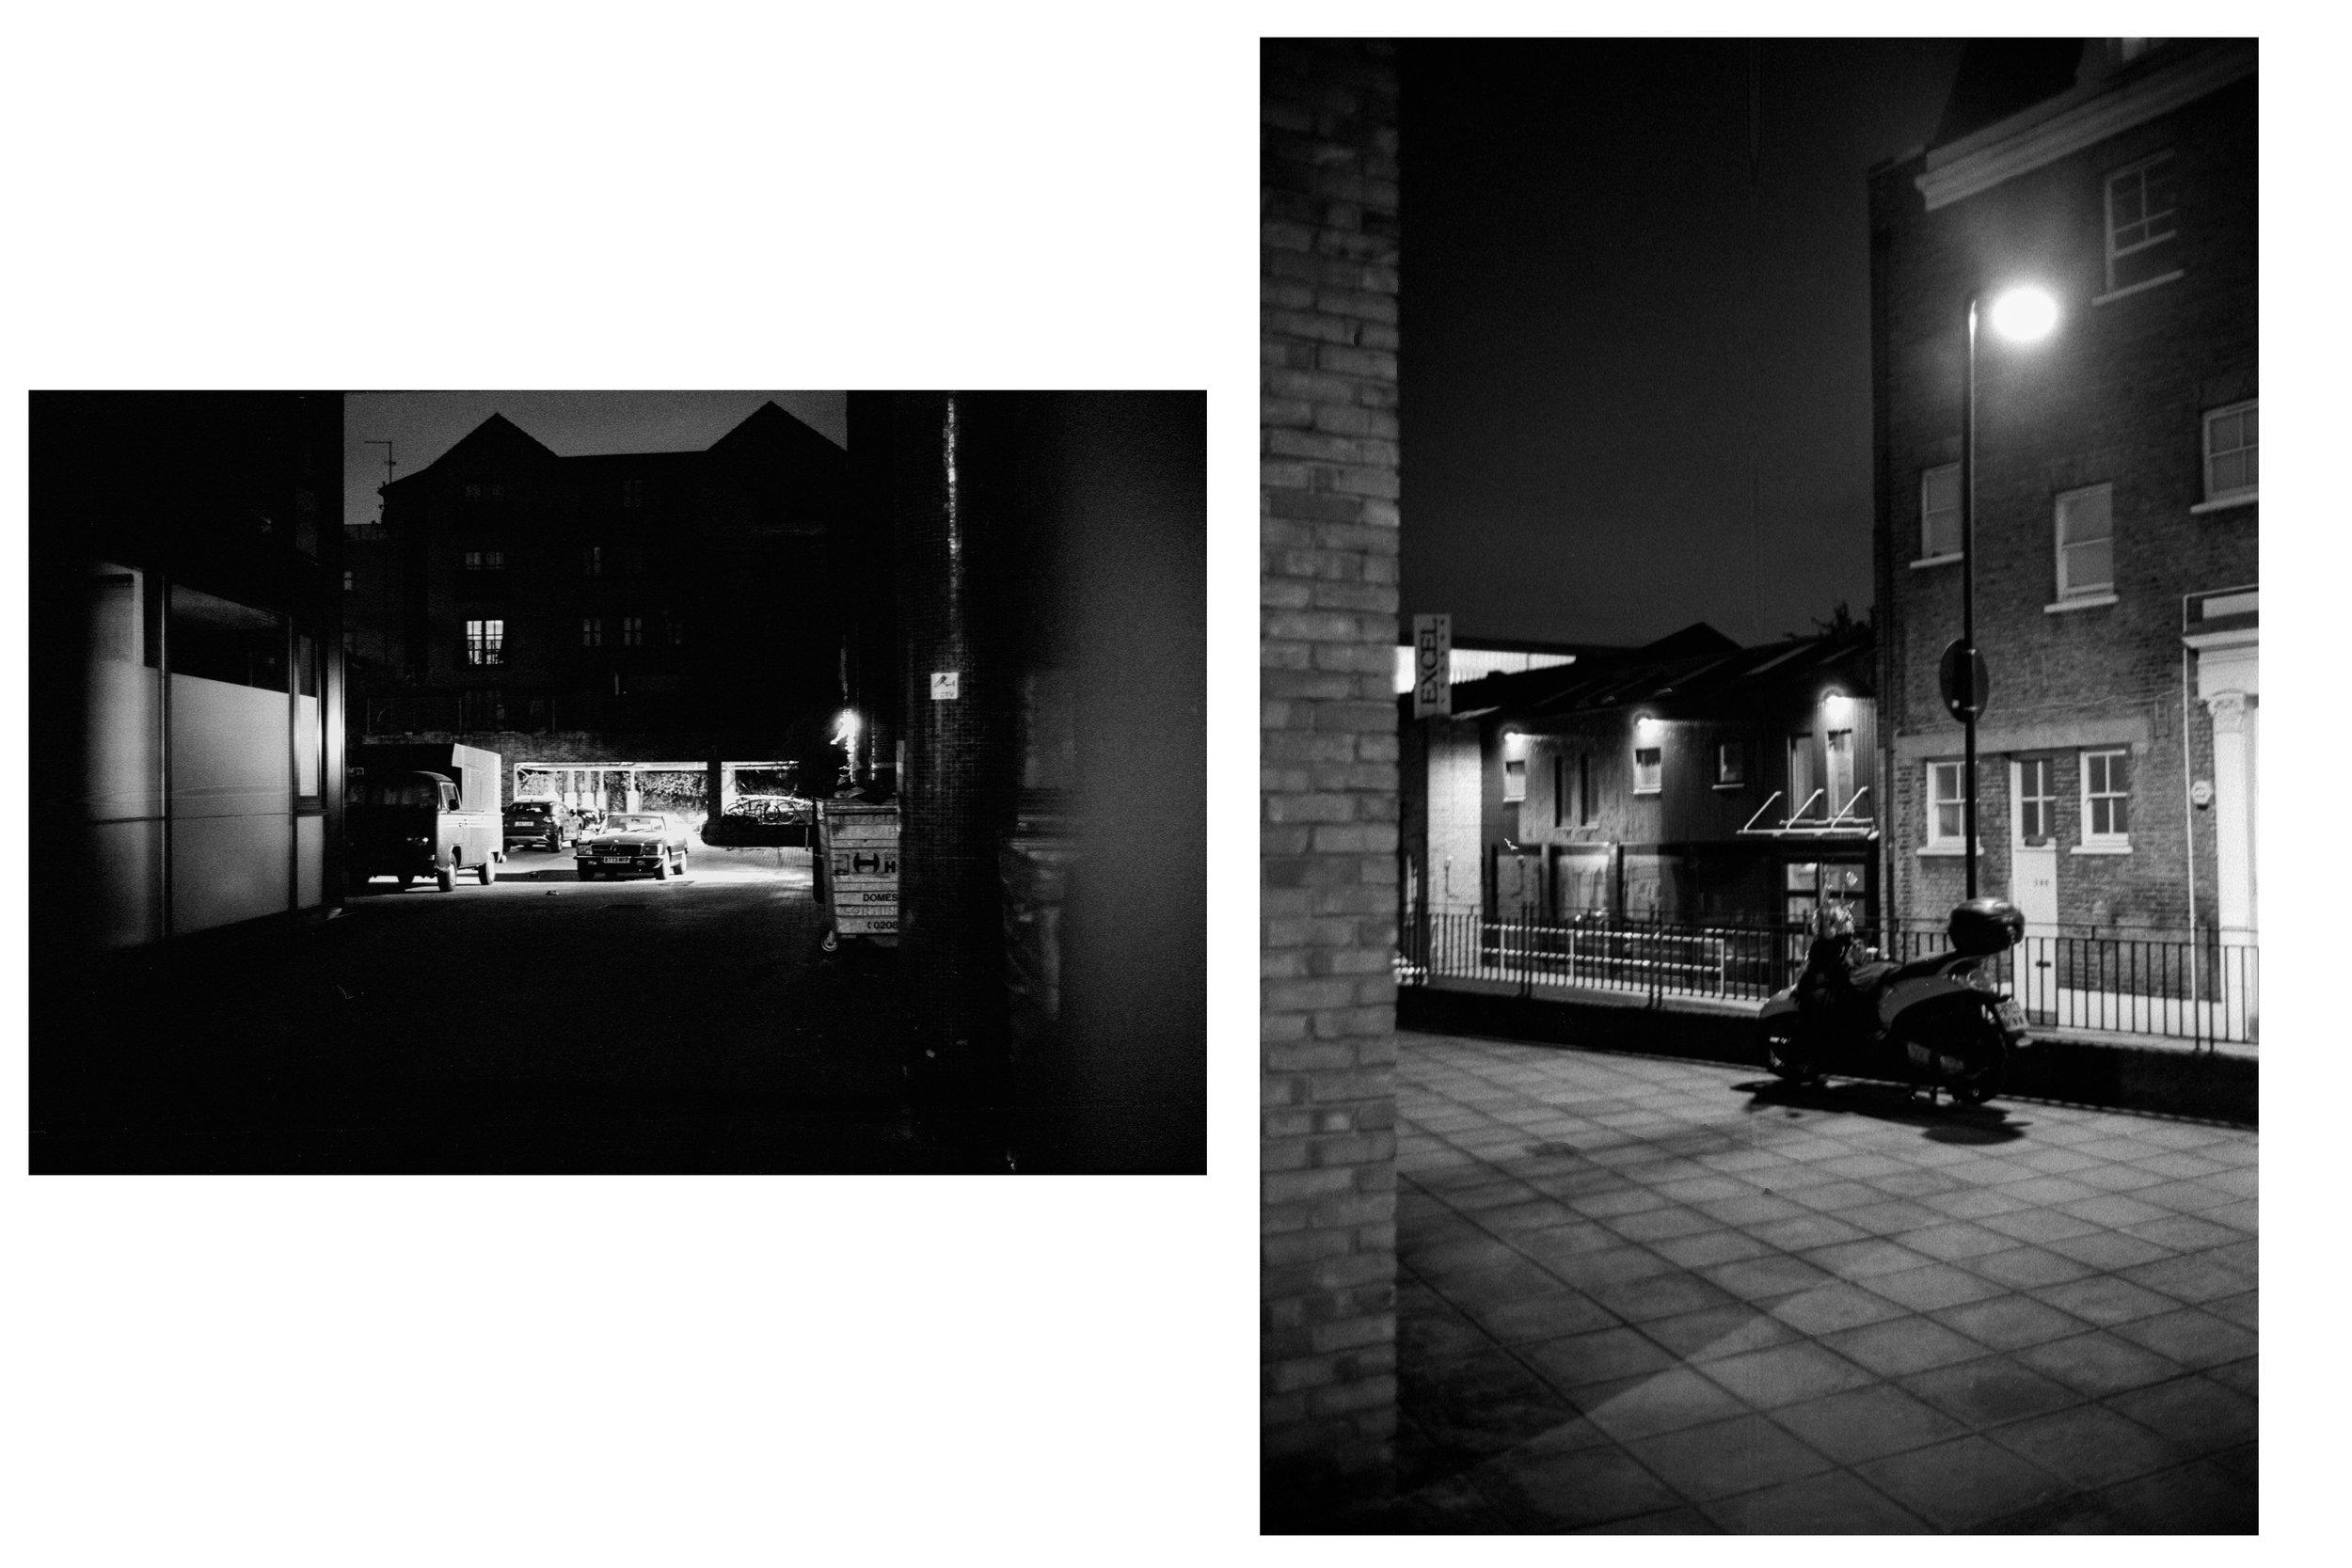 02_streets.jpg